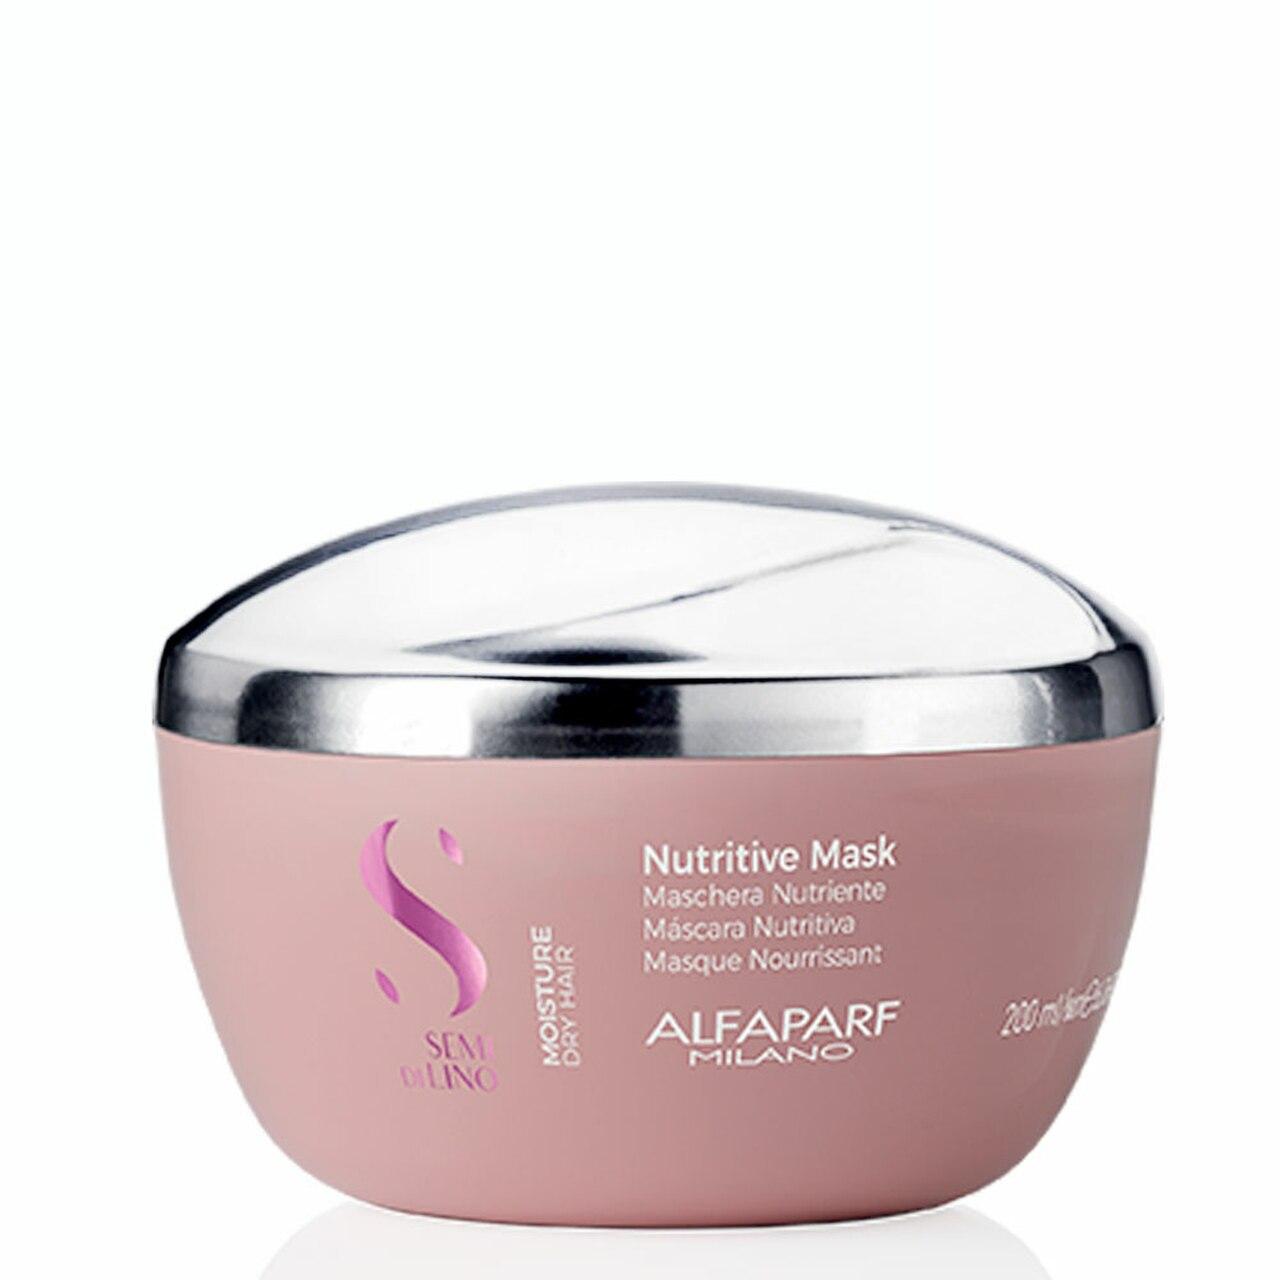 Alfaparf Milano Semi Di LINO Moisture Dry Hair Nutritive Mask 200ml/6.76fl.oz